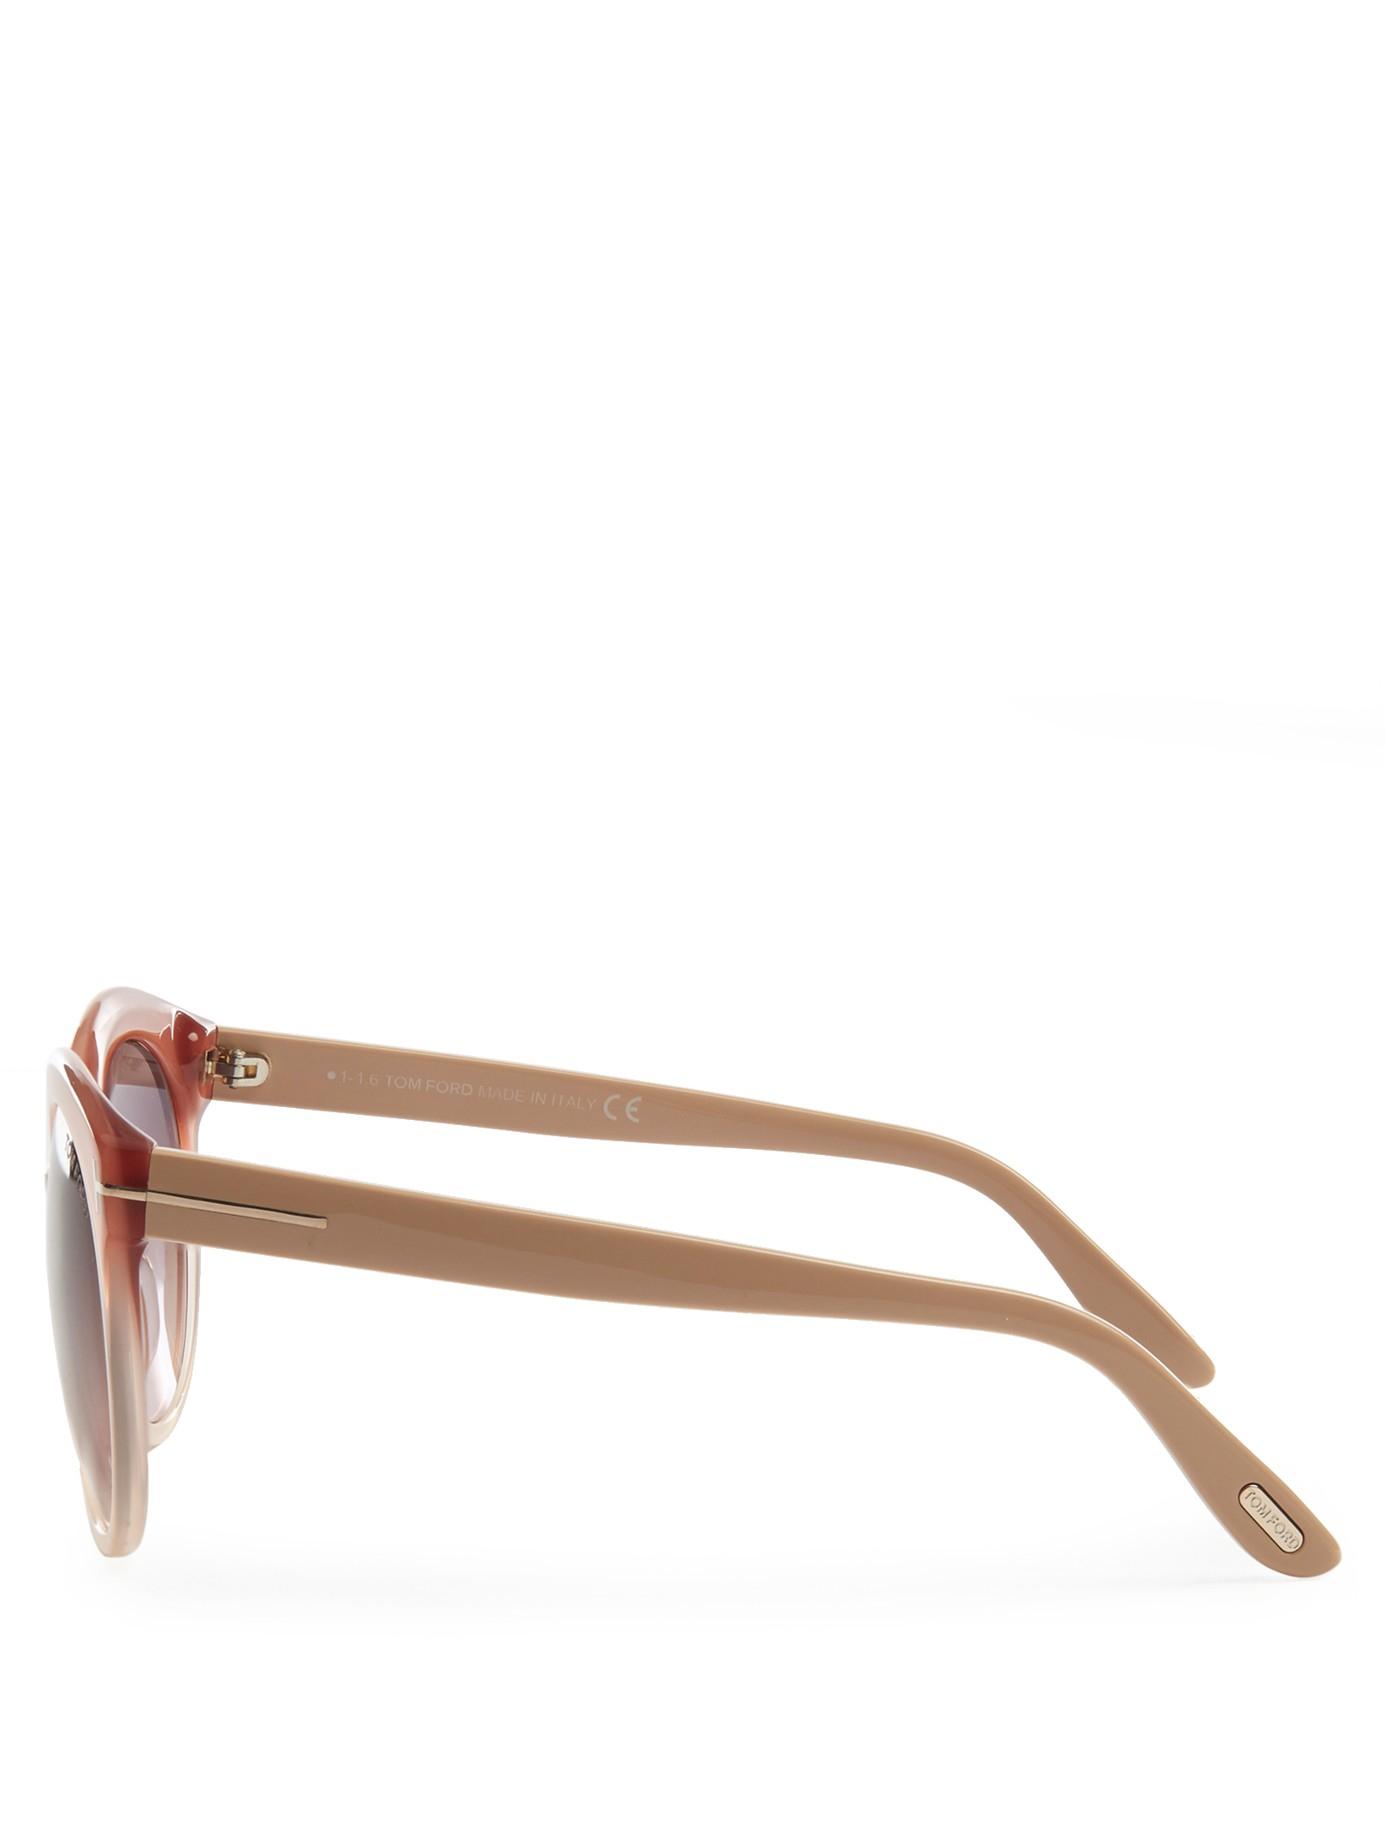 c5c7dafe21b Tom Ford Monica Acetate Sunglasses in Pink - Lyst